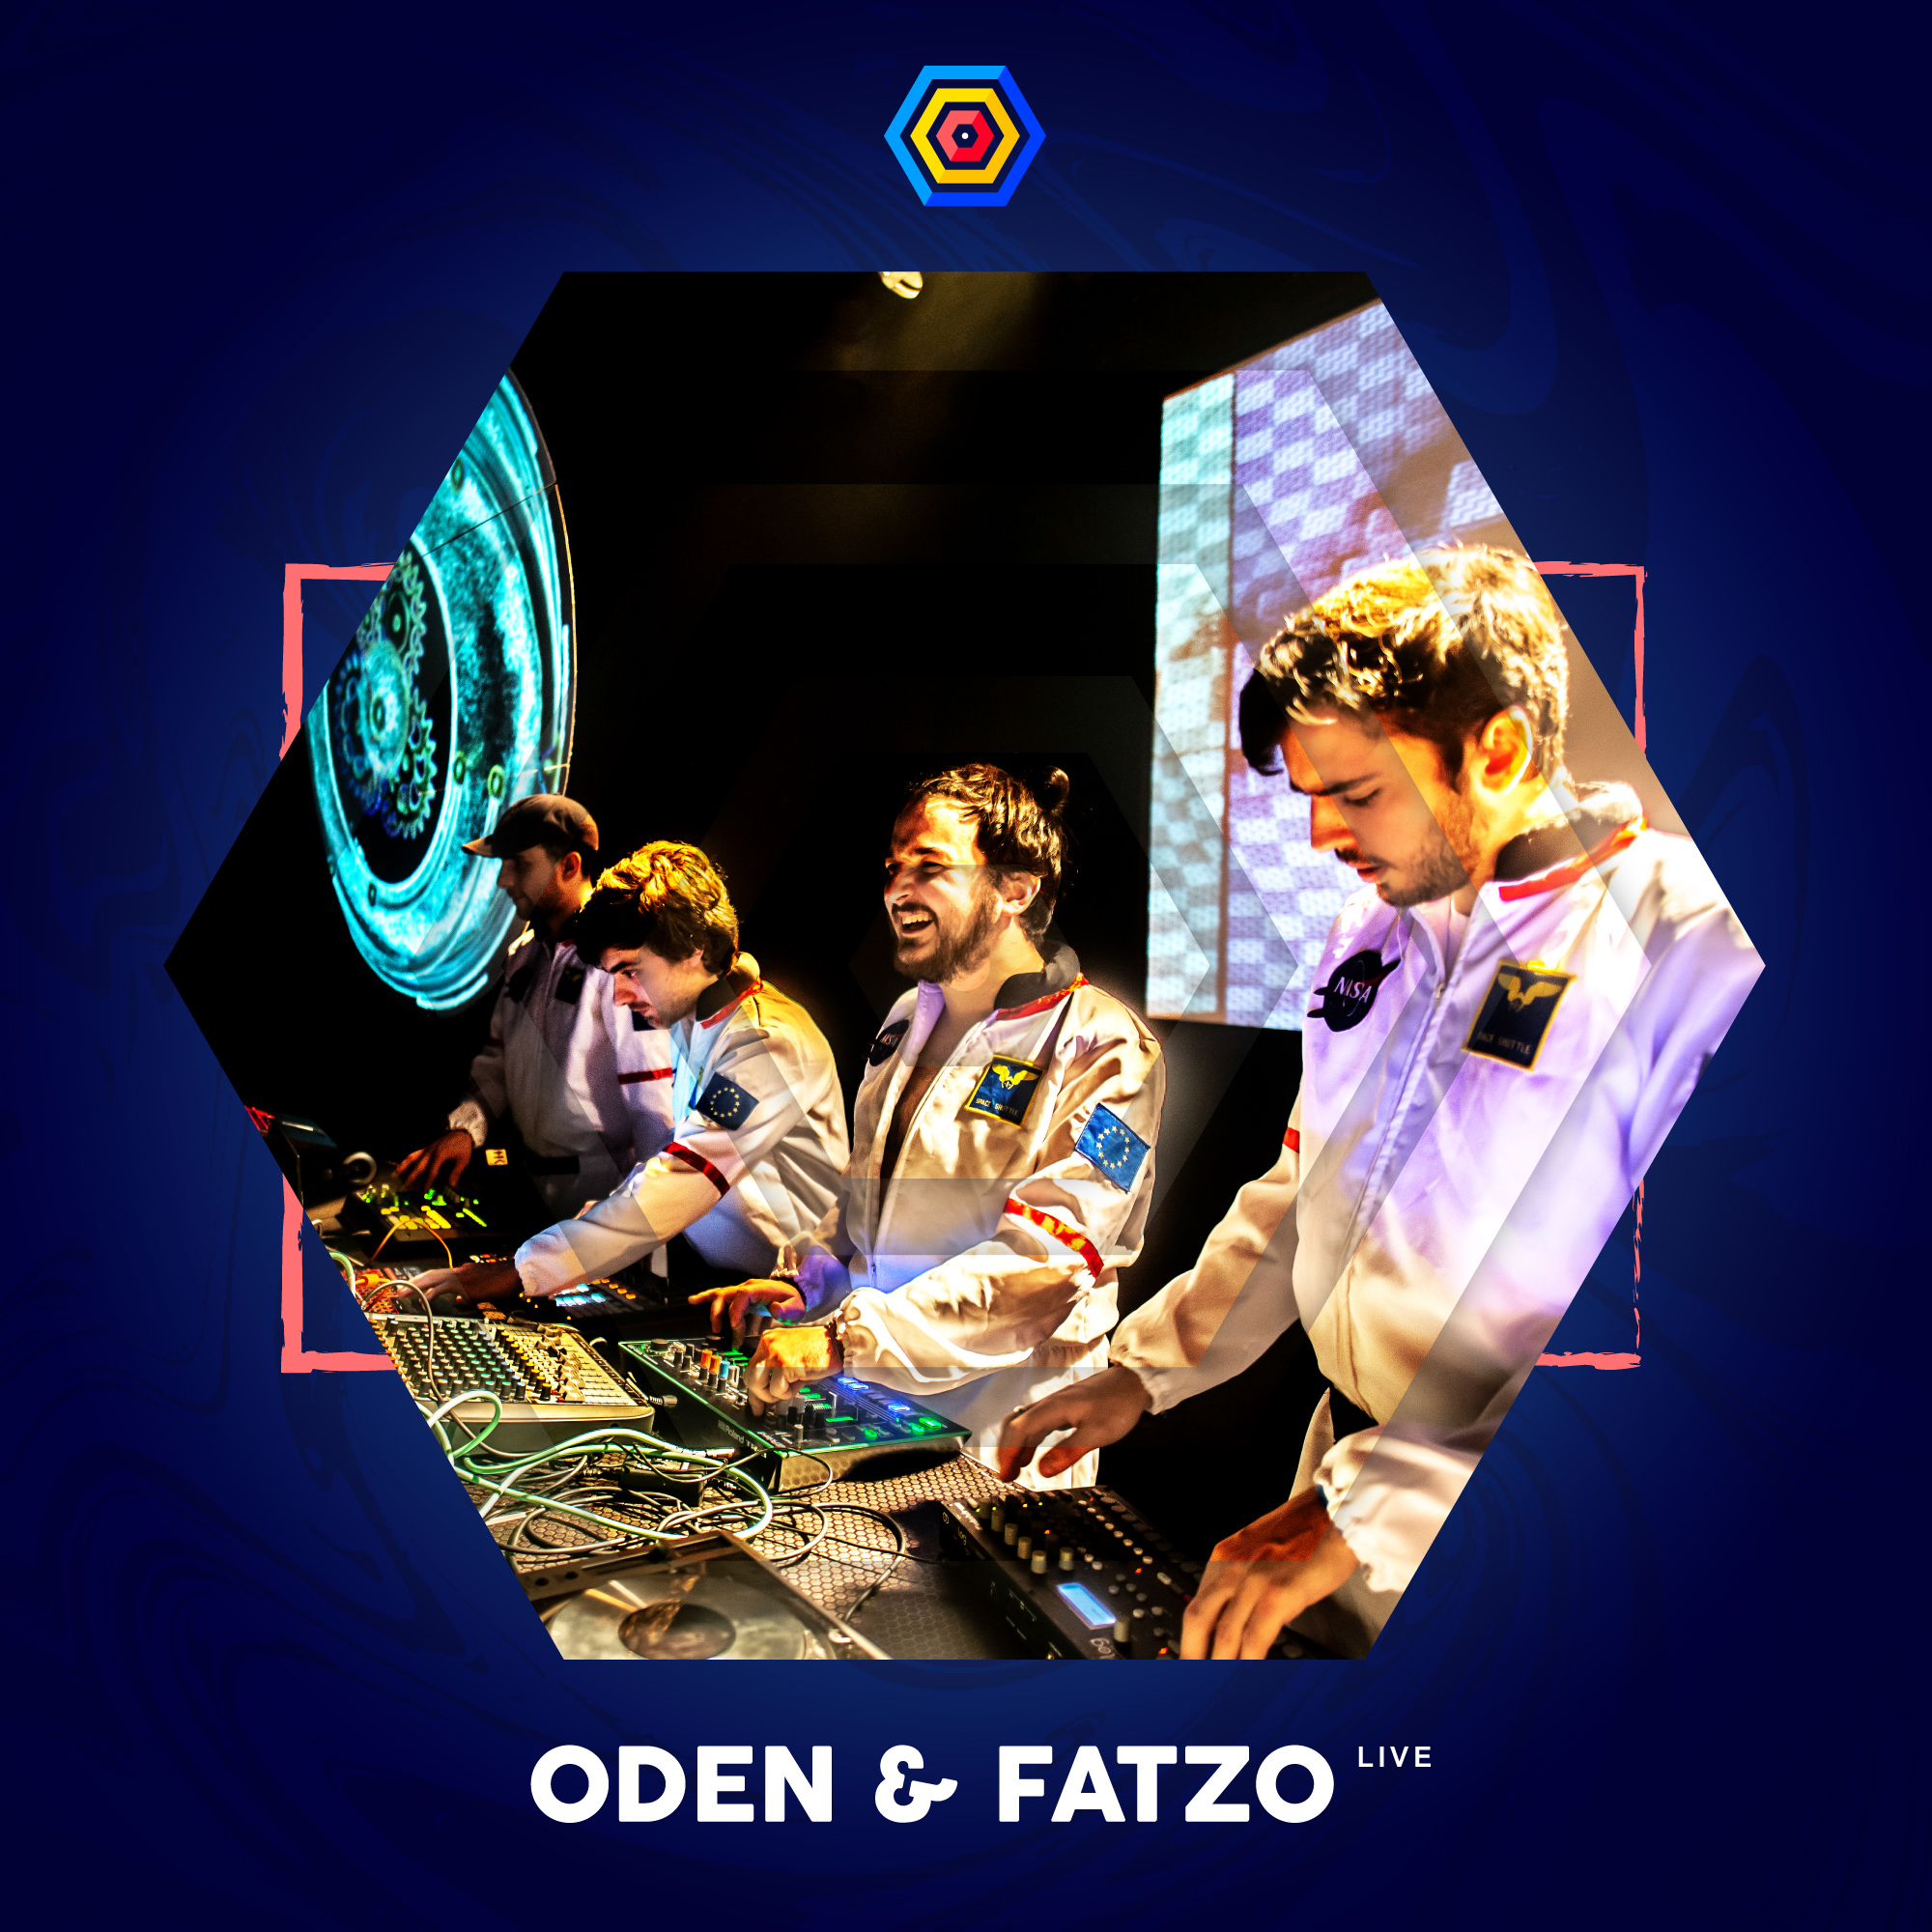 Oden-&-Fatzo